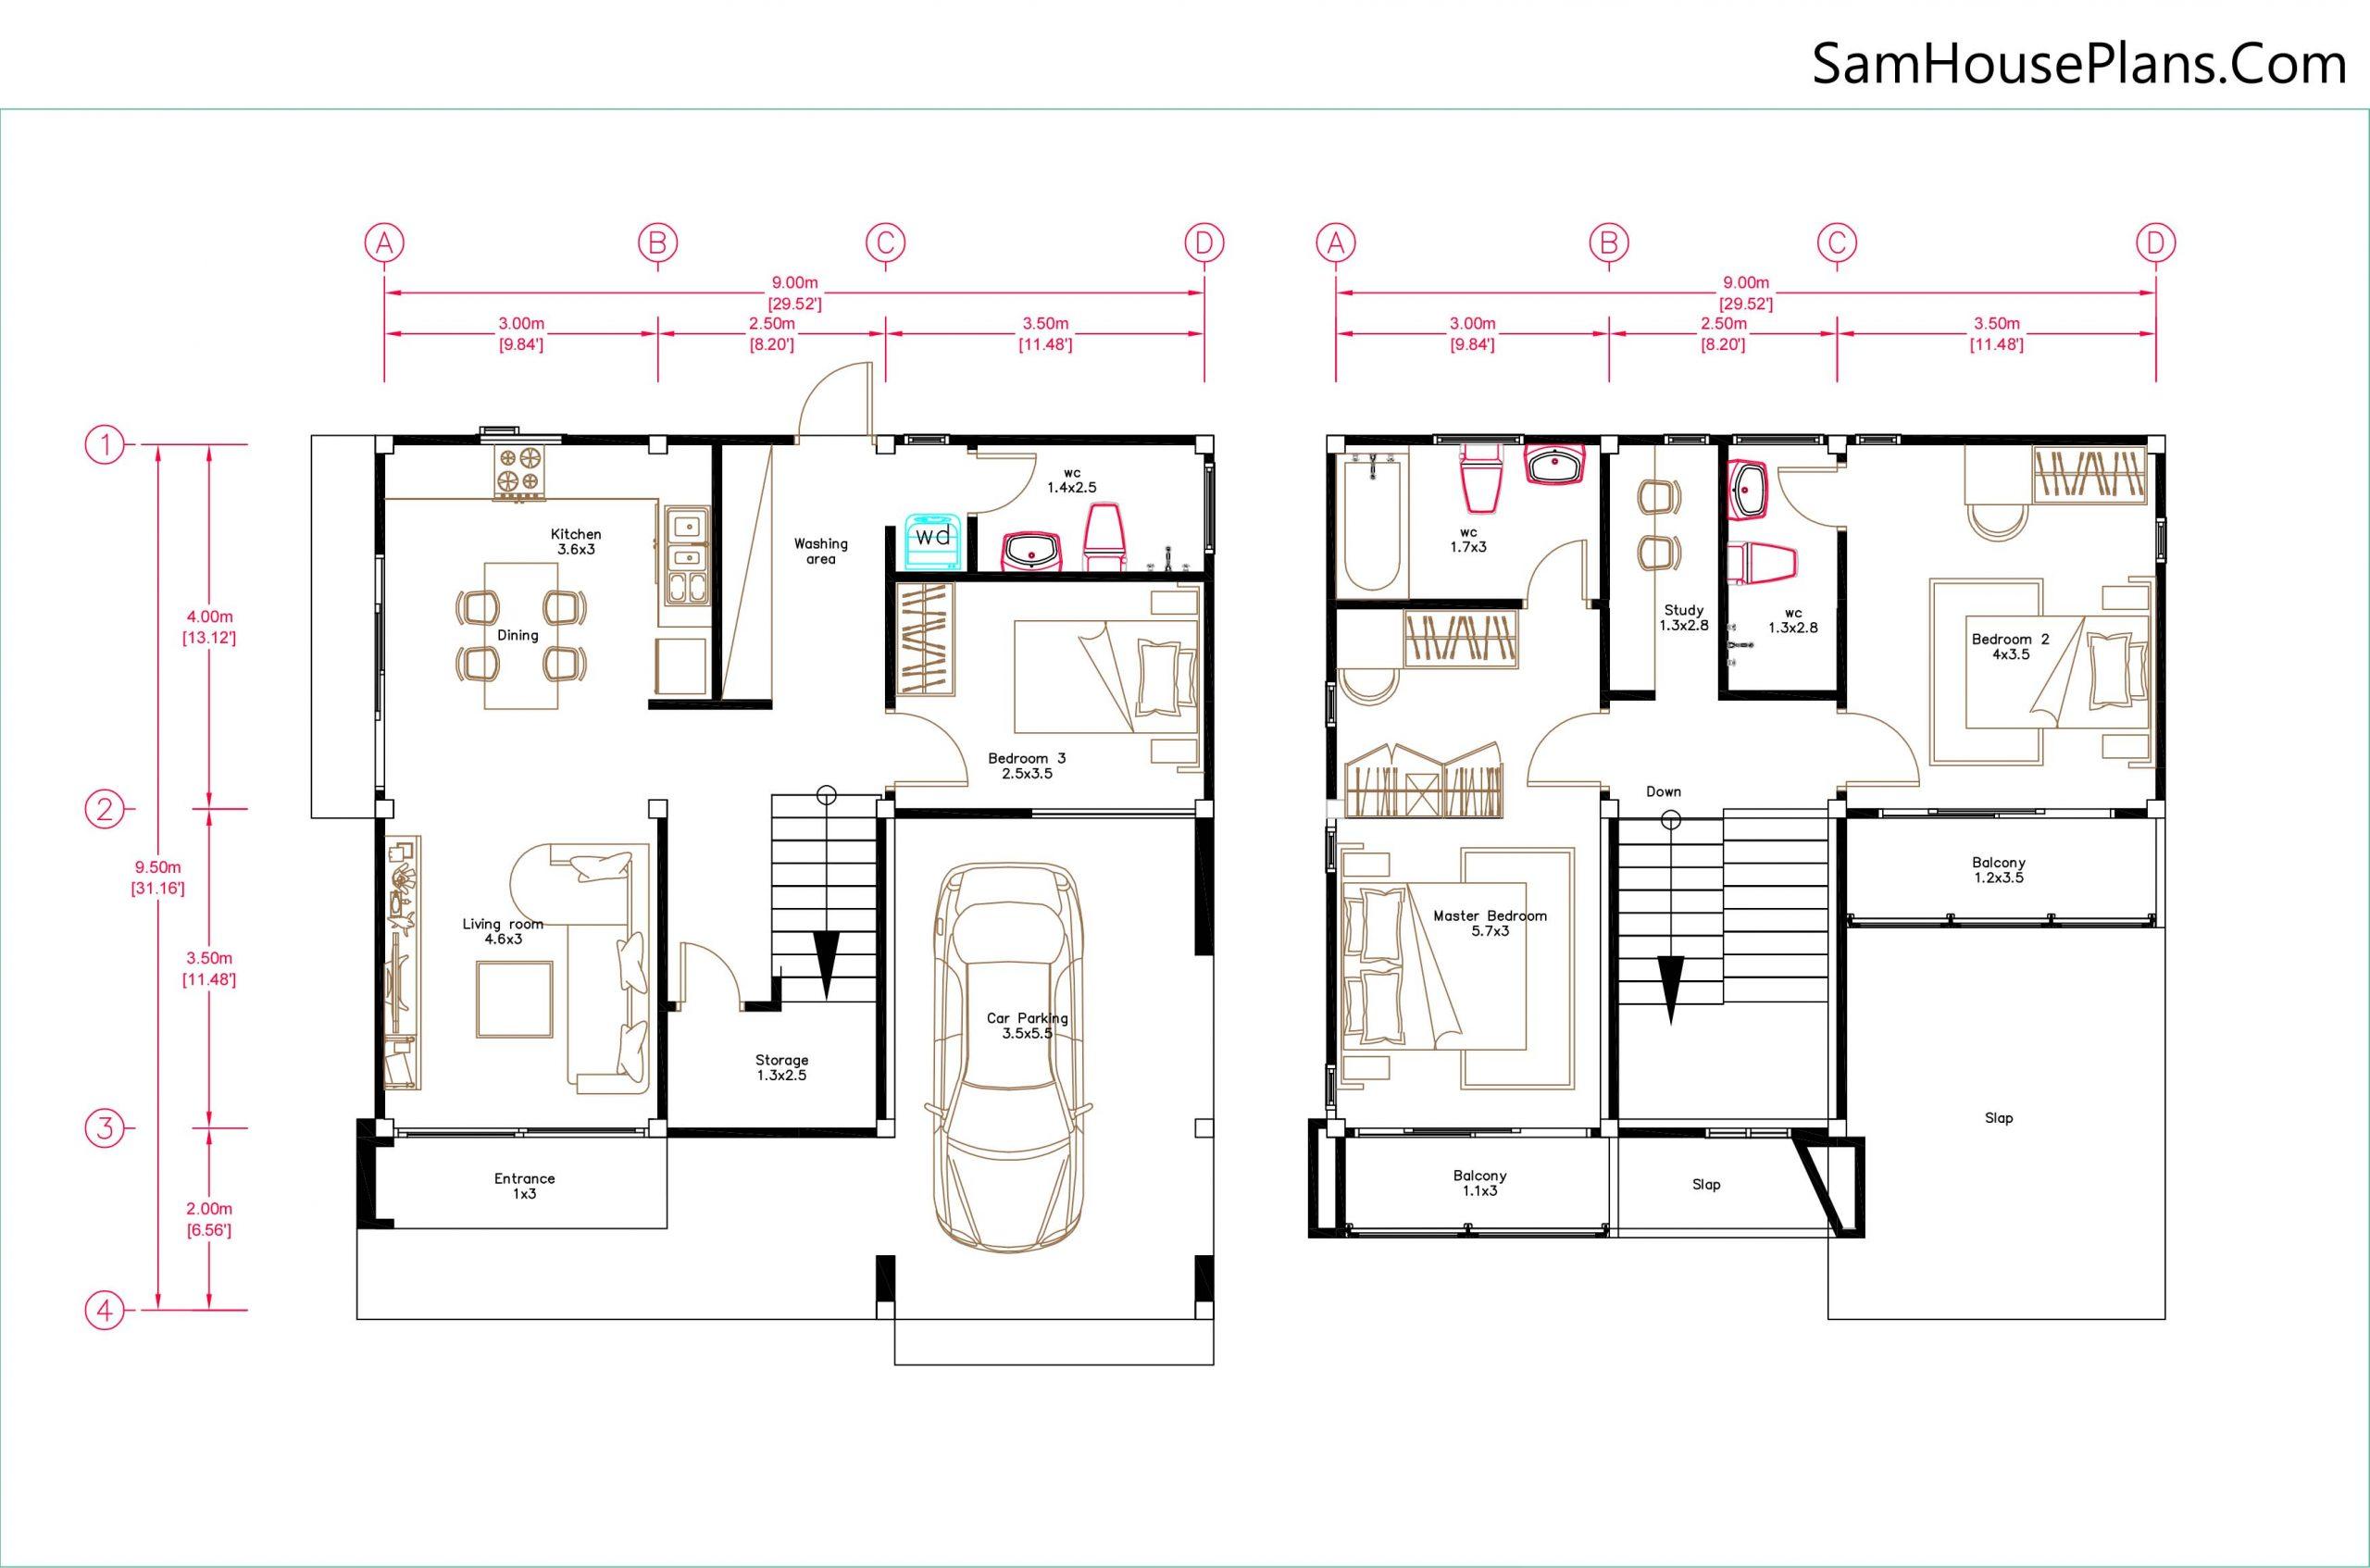 Small House Design 9x9.5 Meter 3 Bedrooms Full PDF Plan Layout floor plan 9x9.5